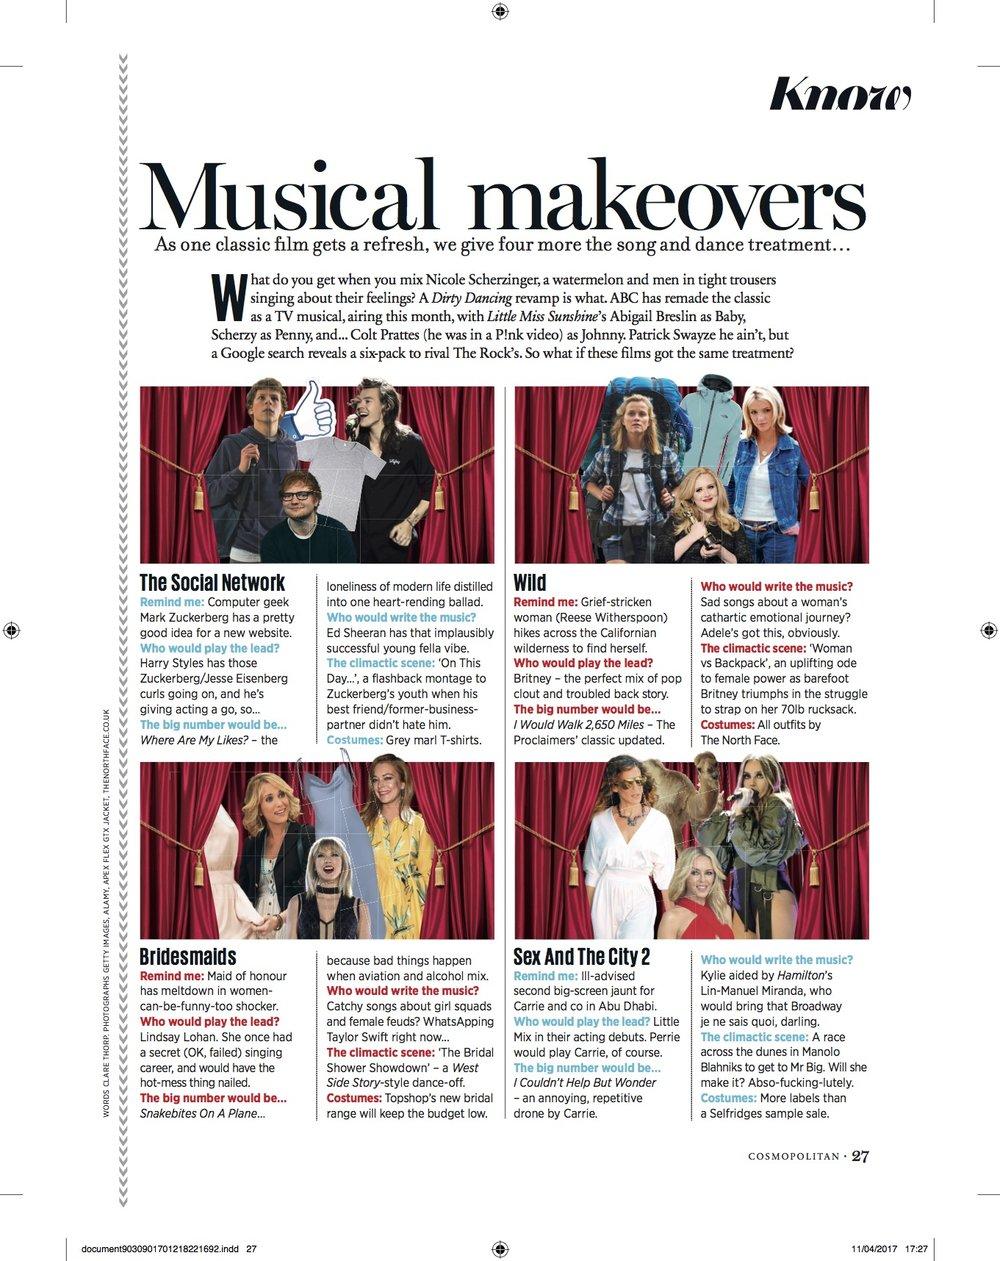 Cosmopolitan musical makeovers.jpg